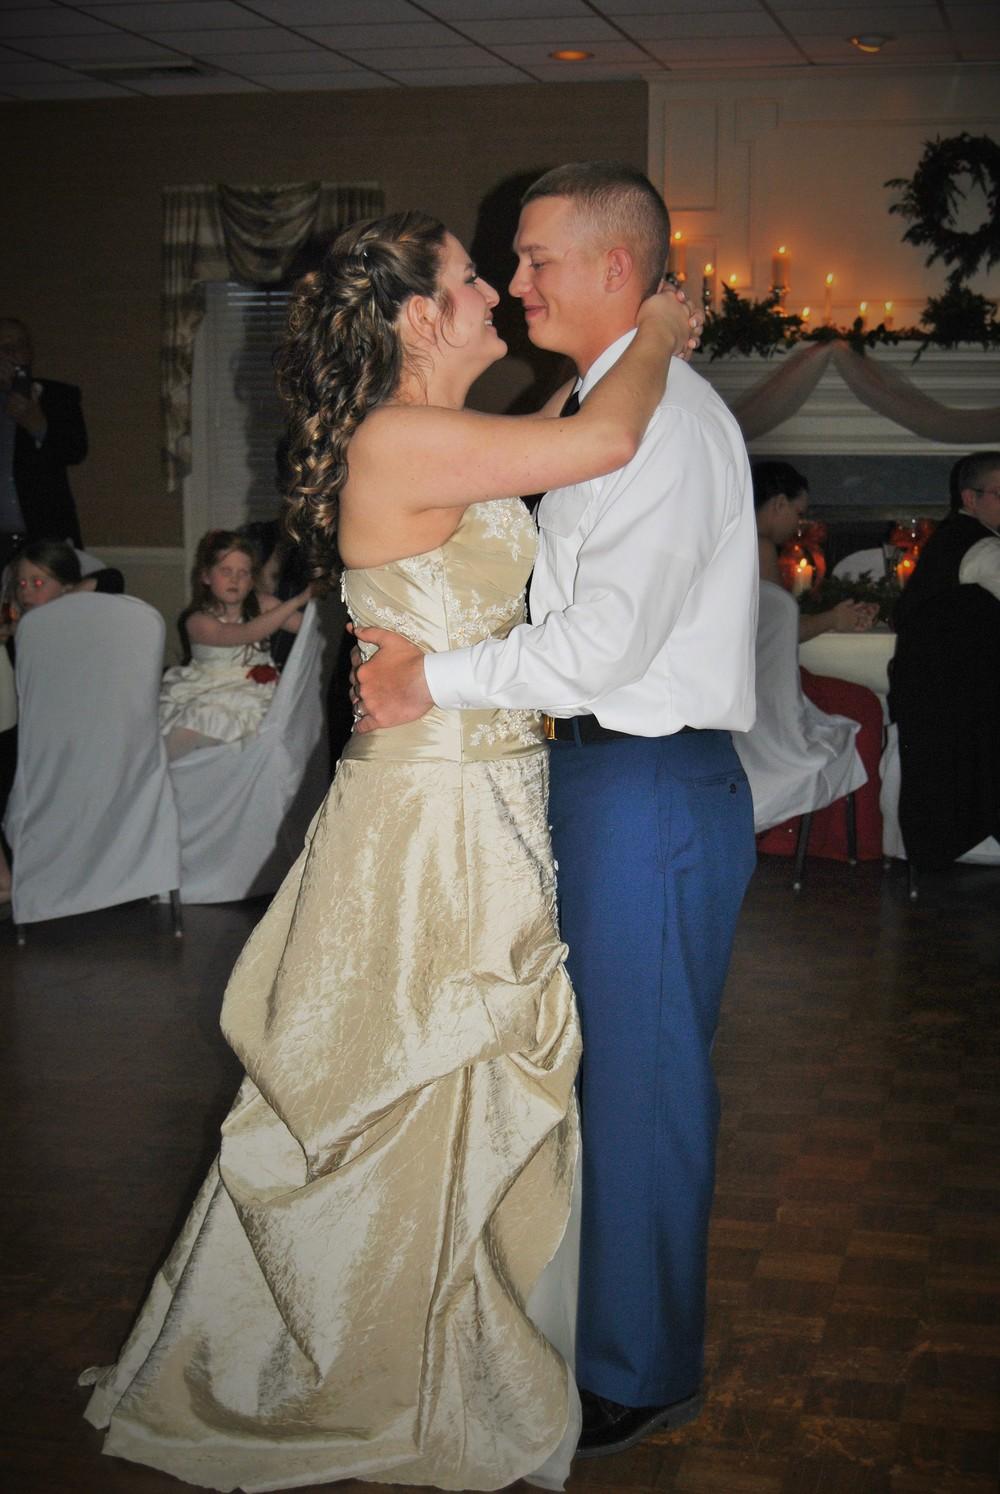 Rowsey-wedding-first-dance.jpg